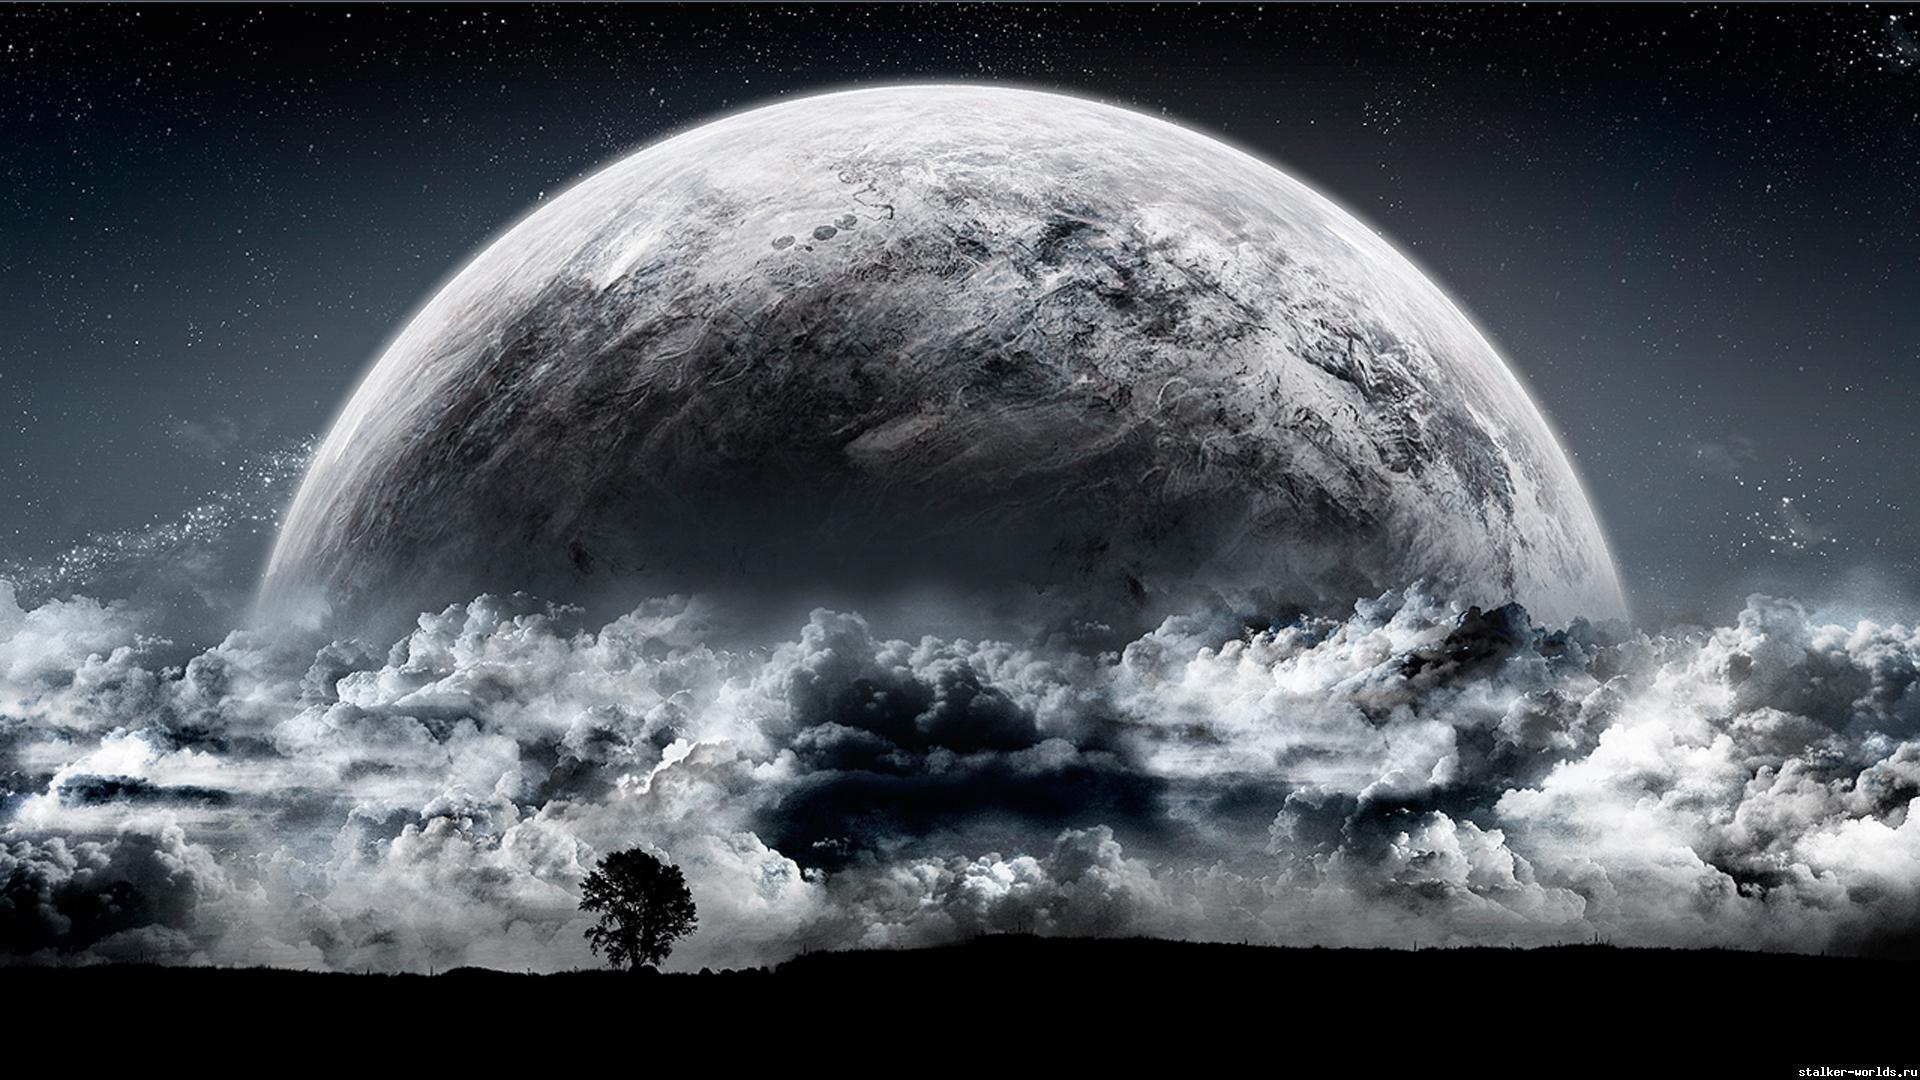 sw_1495996926__9690_3d_space_scene.jpg